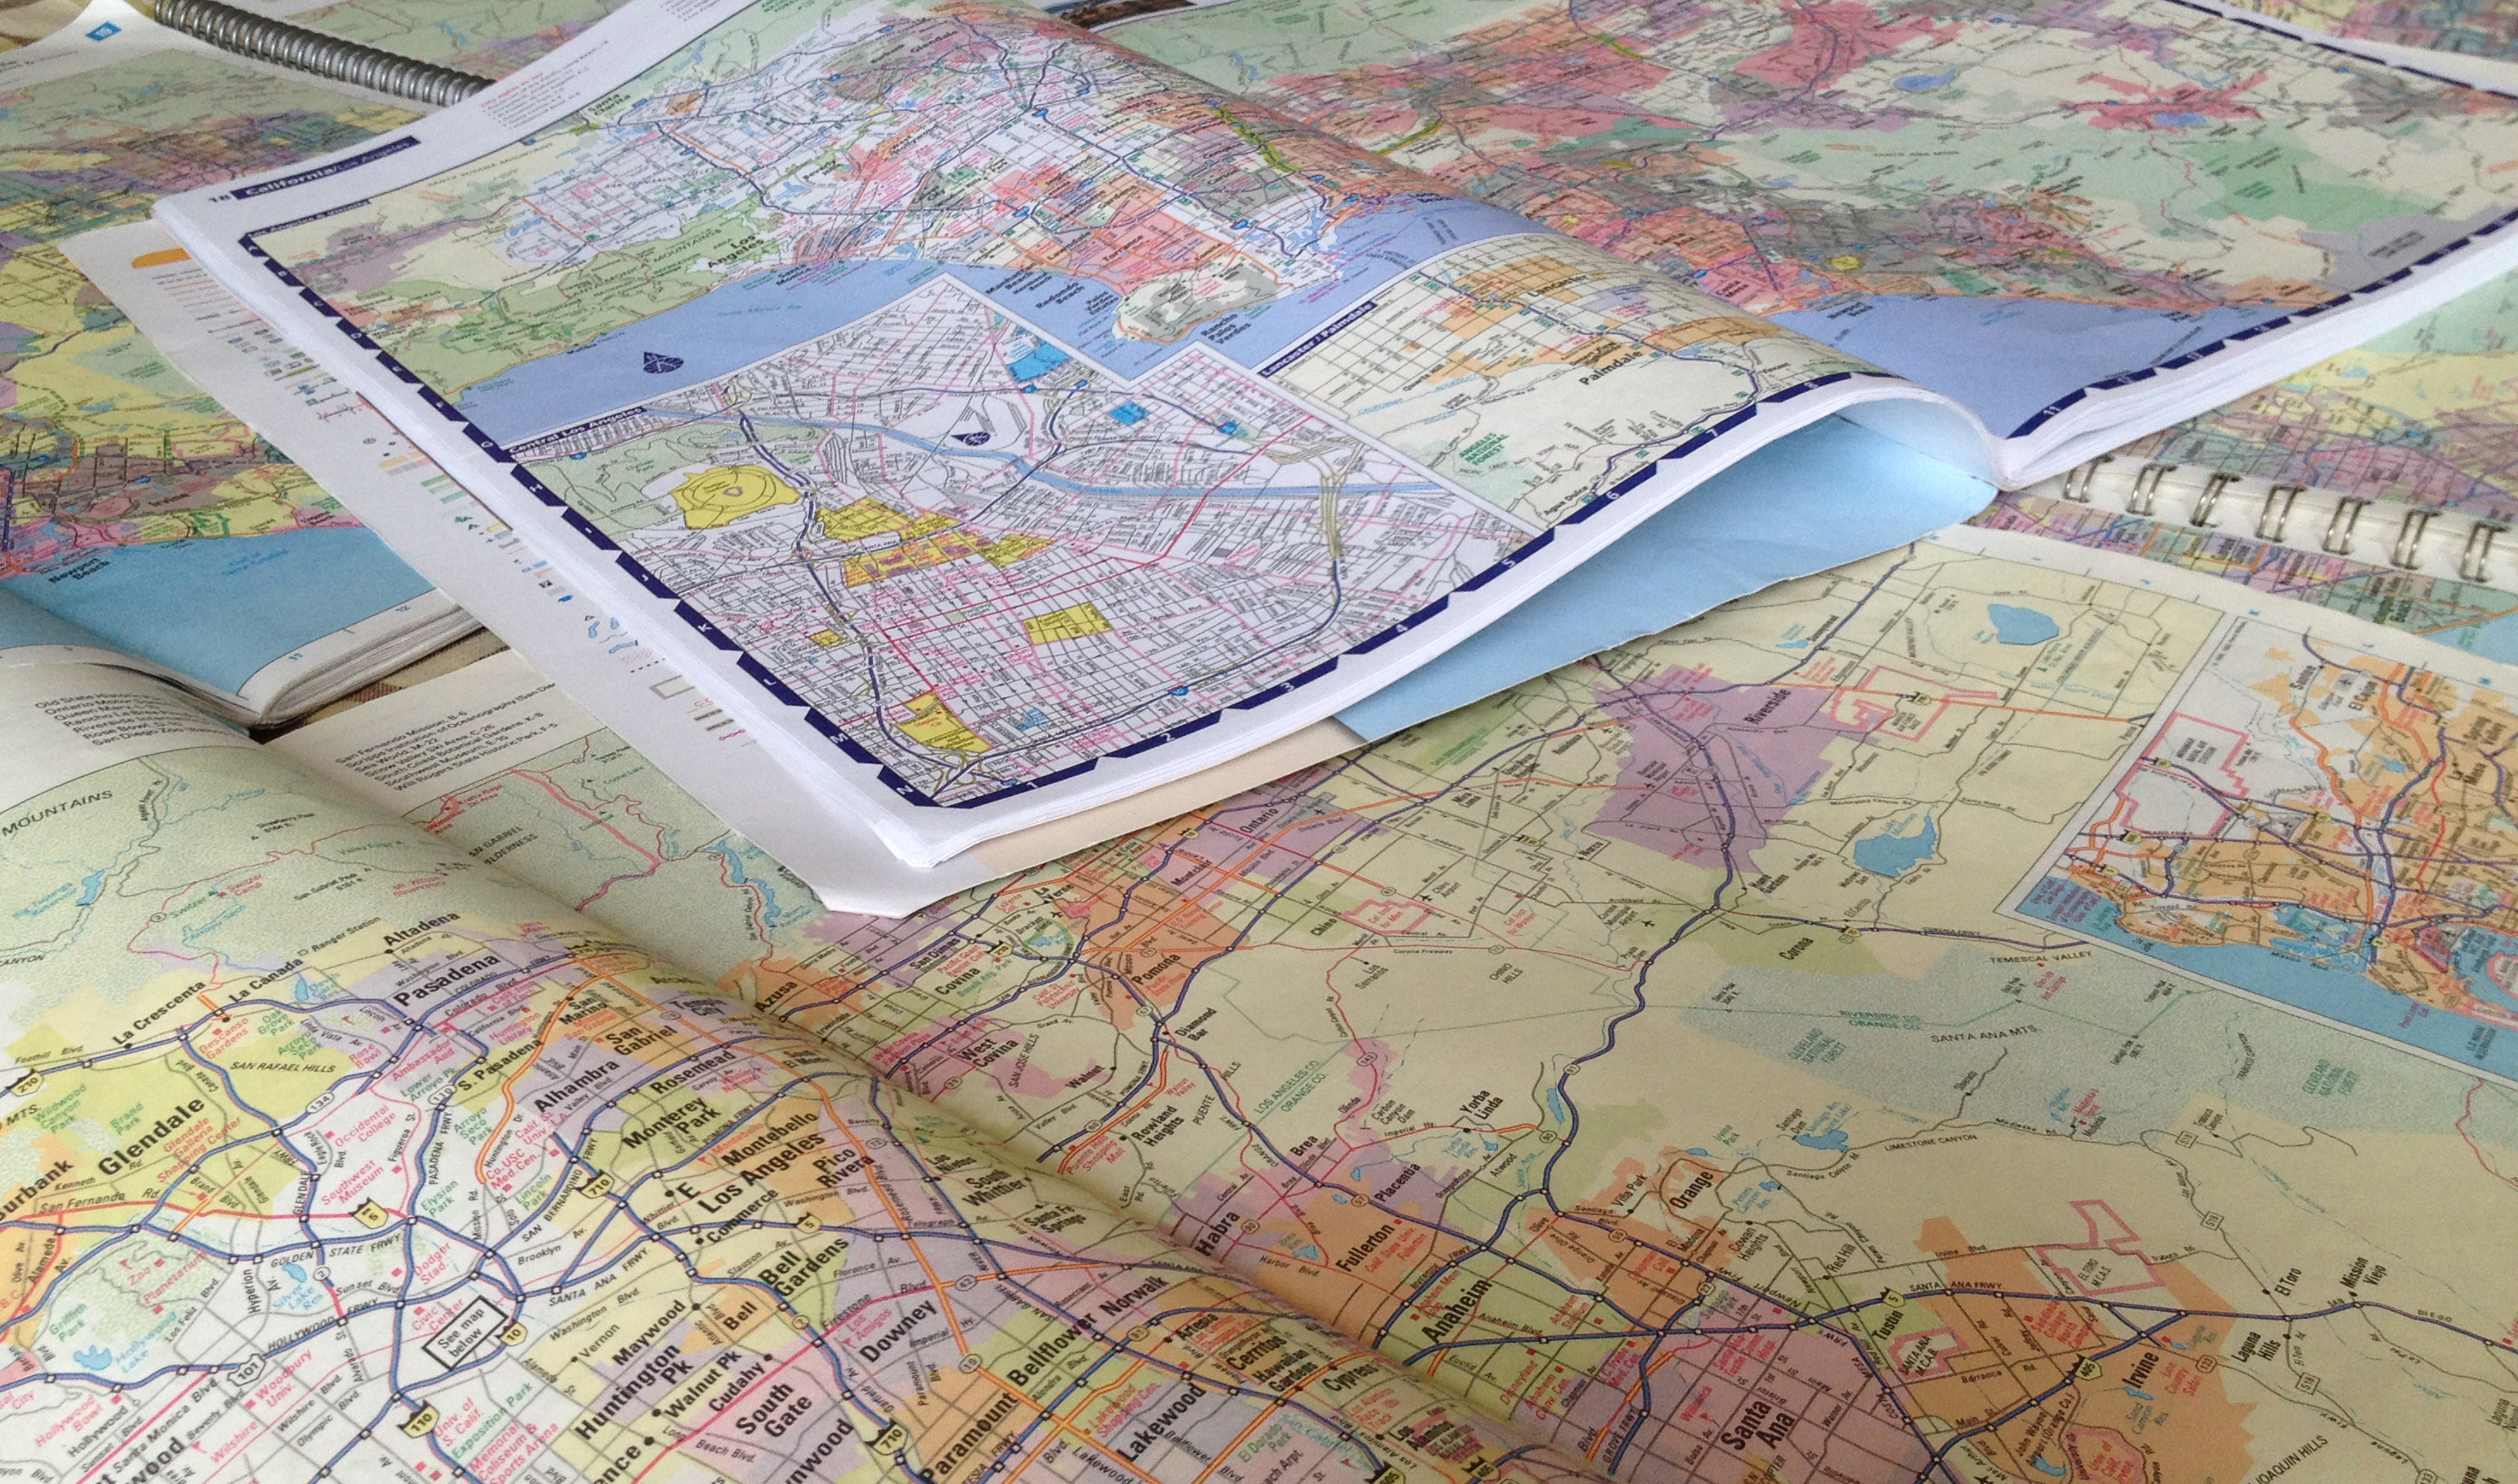 Randmcnally Free Print Map Rand Mcnally California Map - Klipy - Rand Mcnally California Map